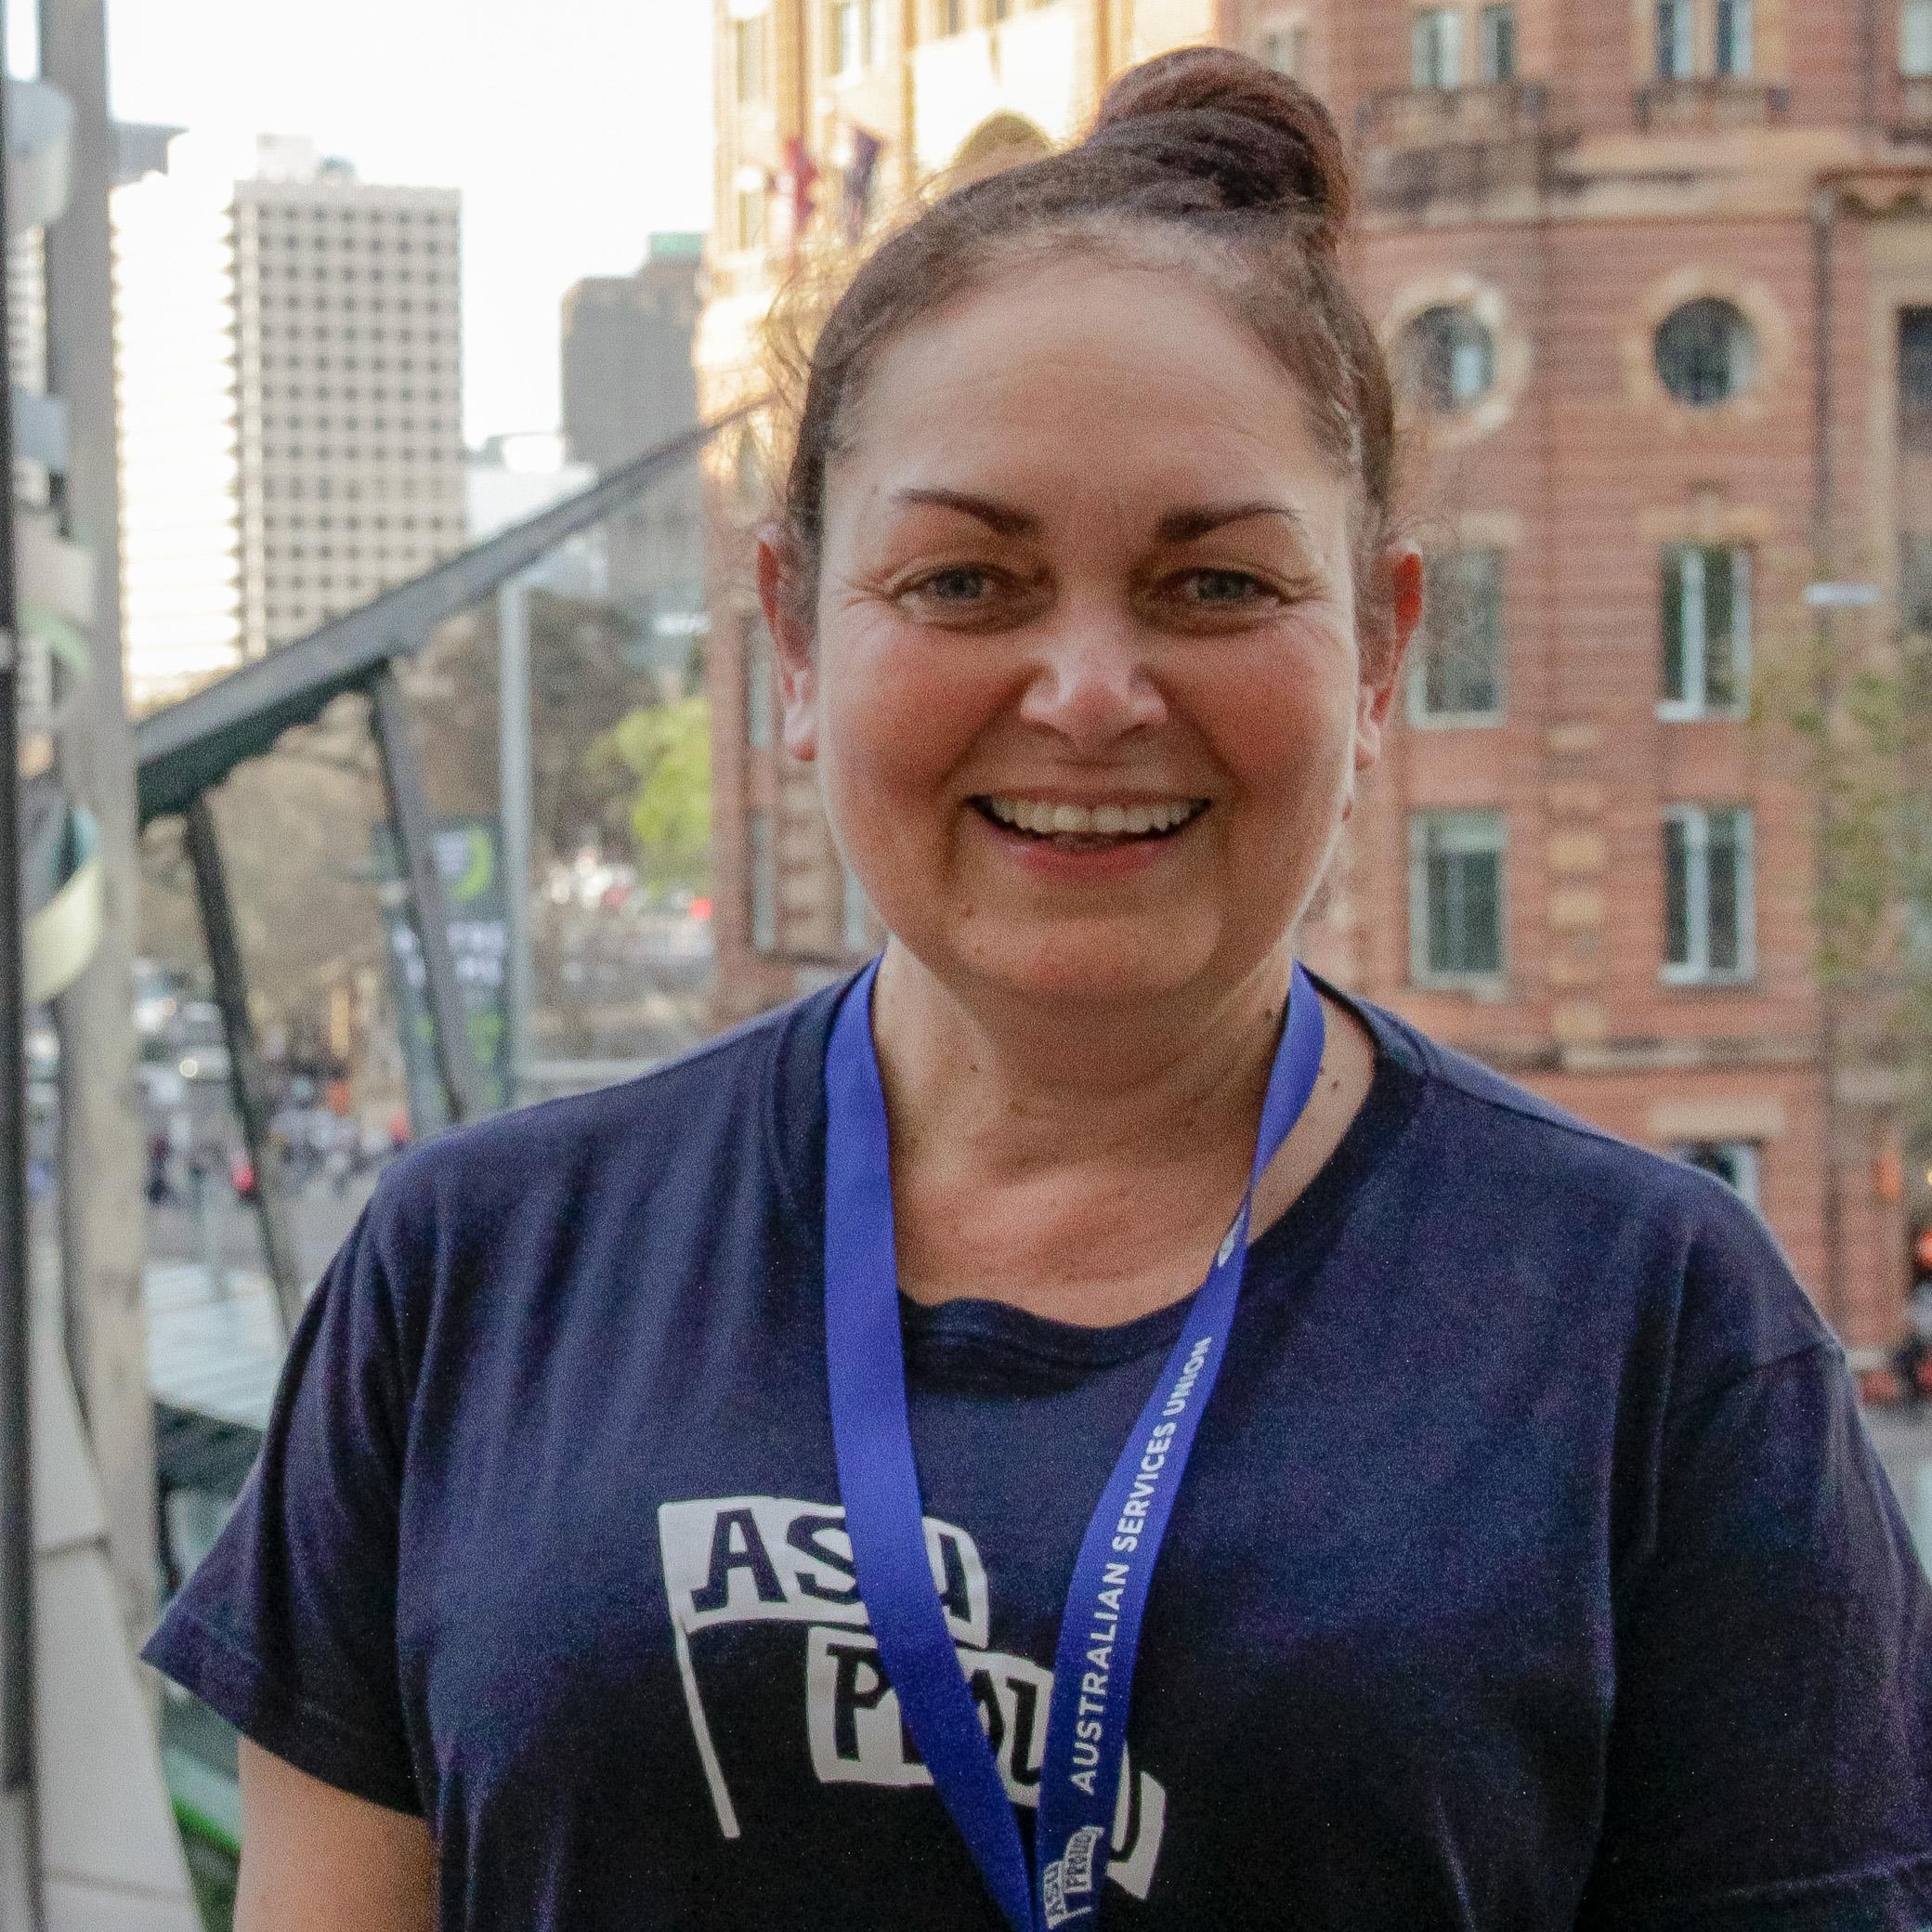 Julie Perkins won the Fran Tierney Award